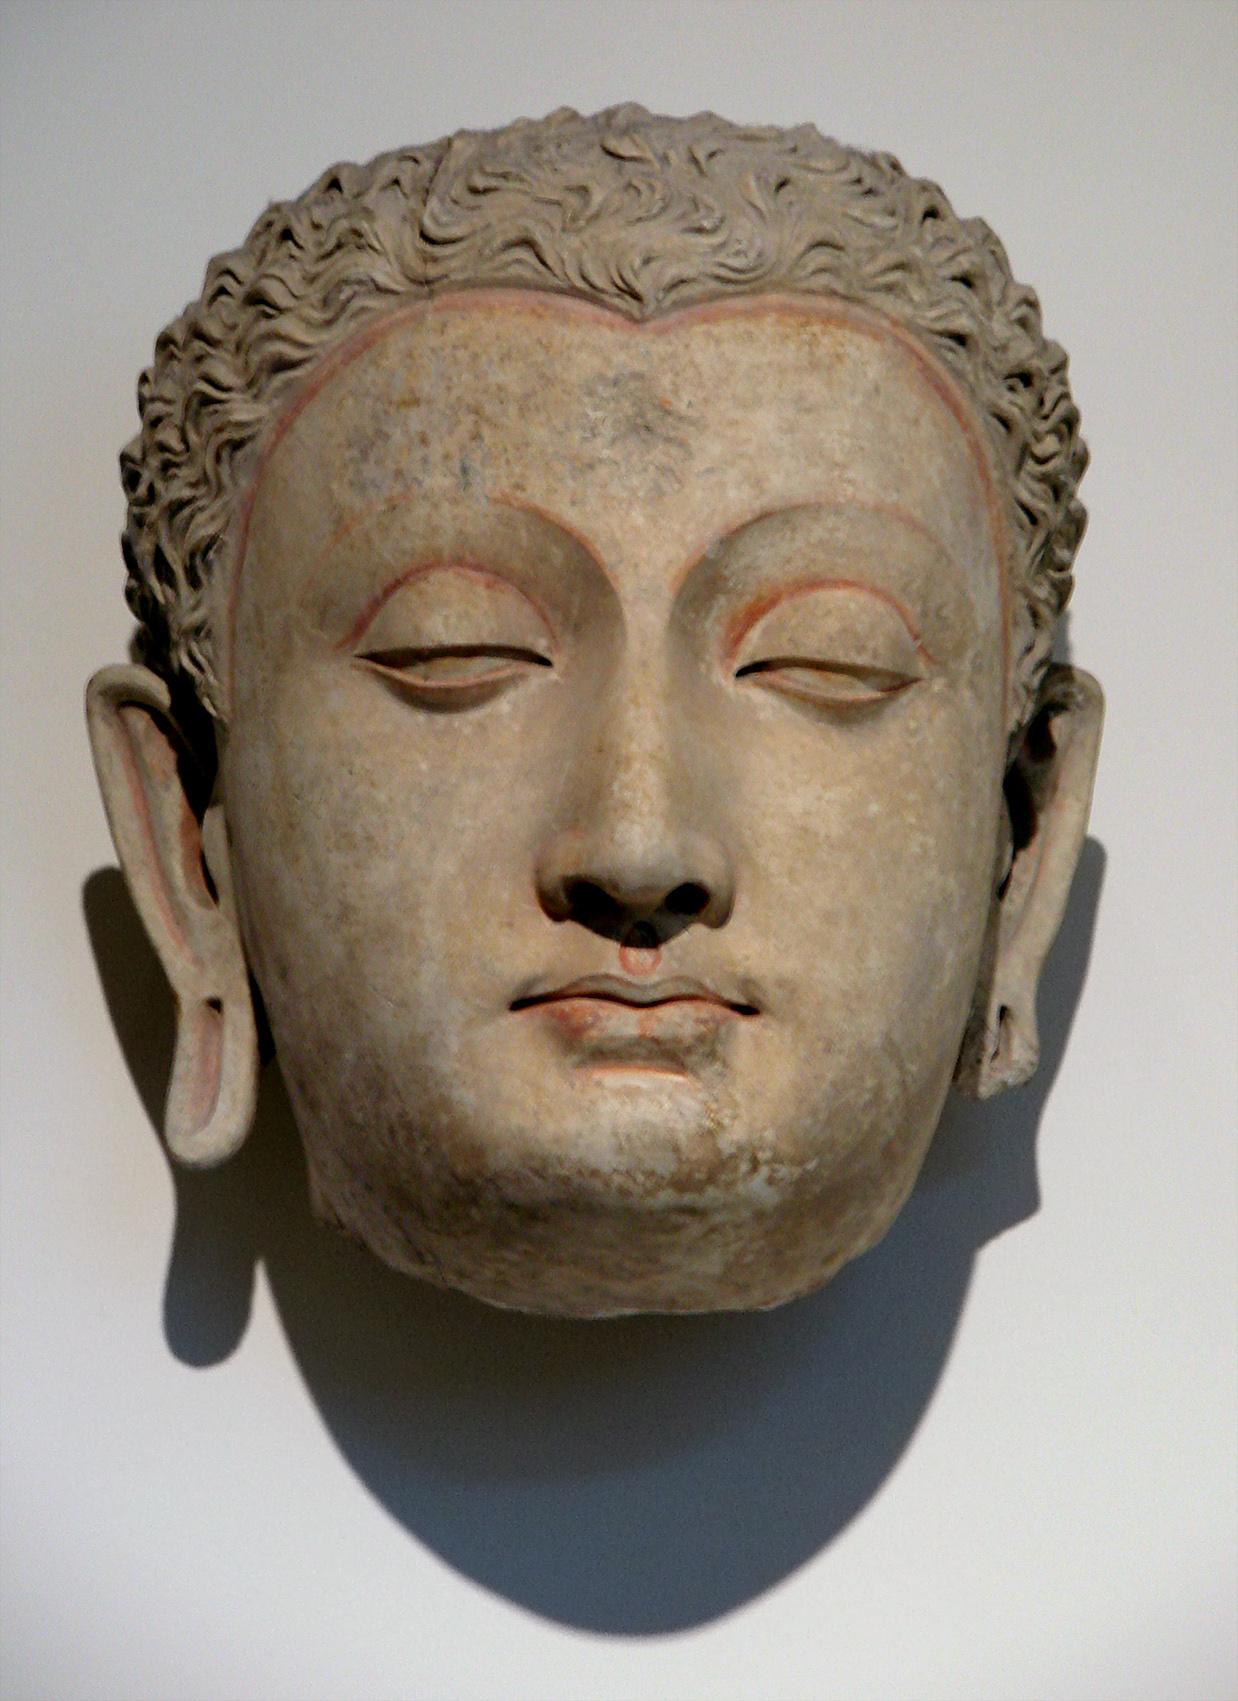 http://upload.wikimedia.org/wikipedia/commons/2/2a/Bouddha_Hadda_Guimet_181172.jpg